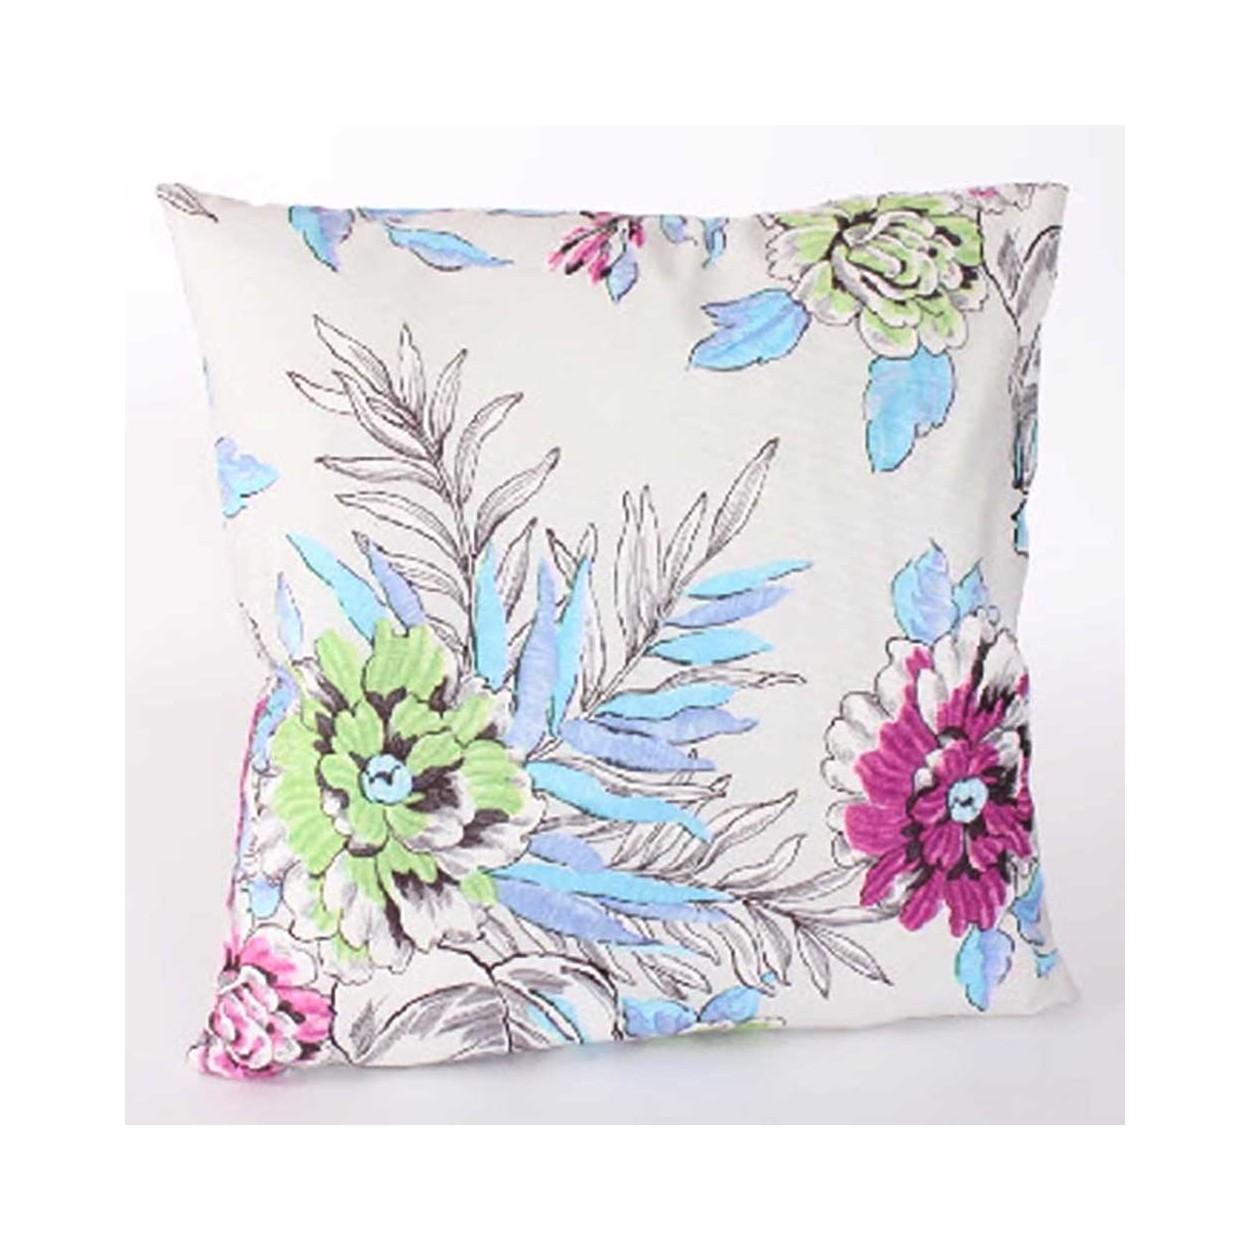 Coj n cuadrado floral fucsia azul 45x45 hogar y m s - Cojin cuadrado suelo ...